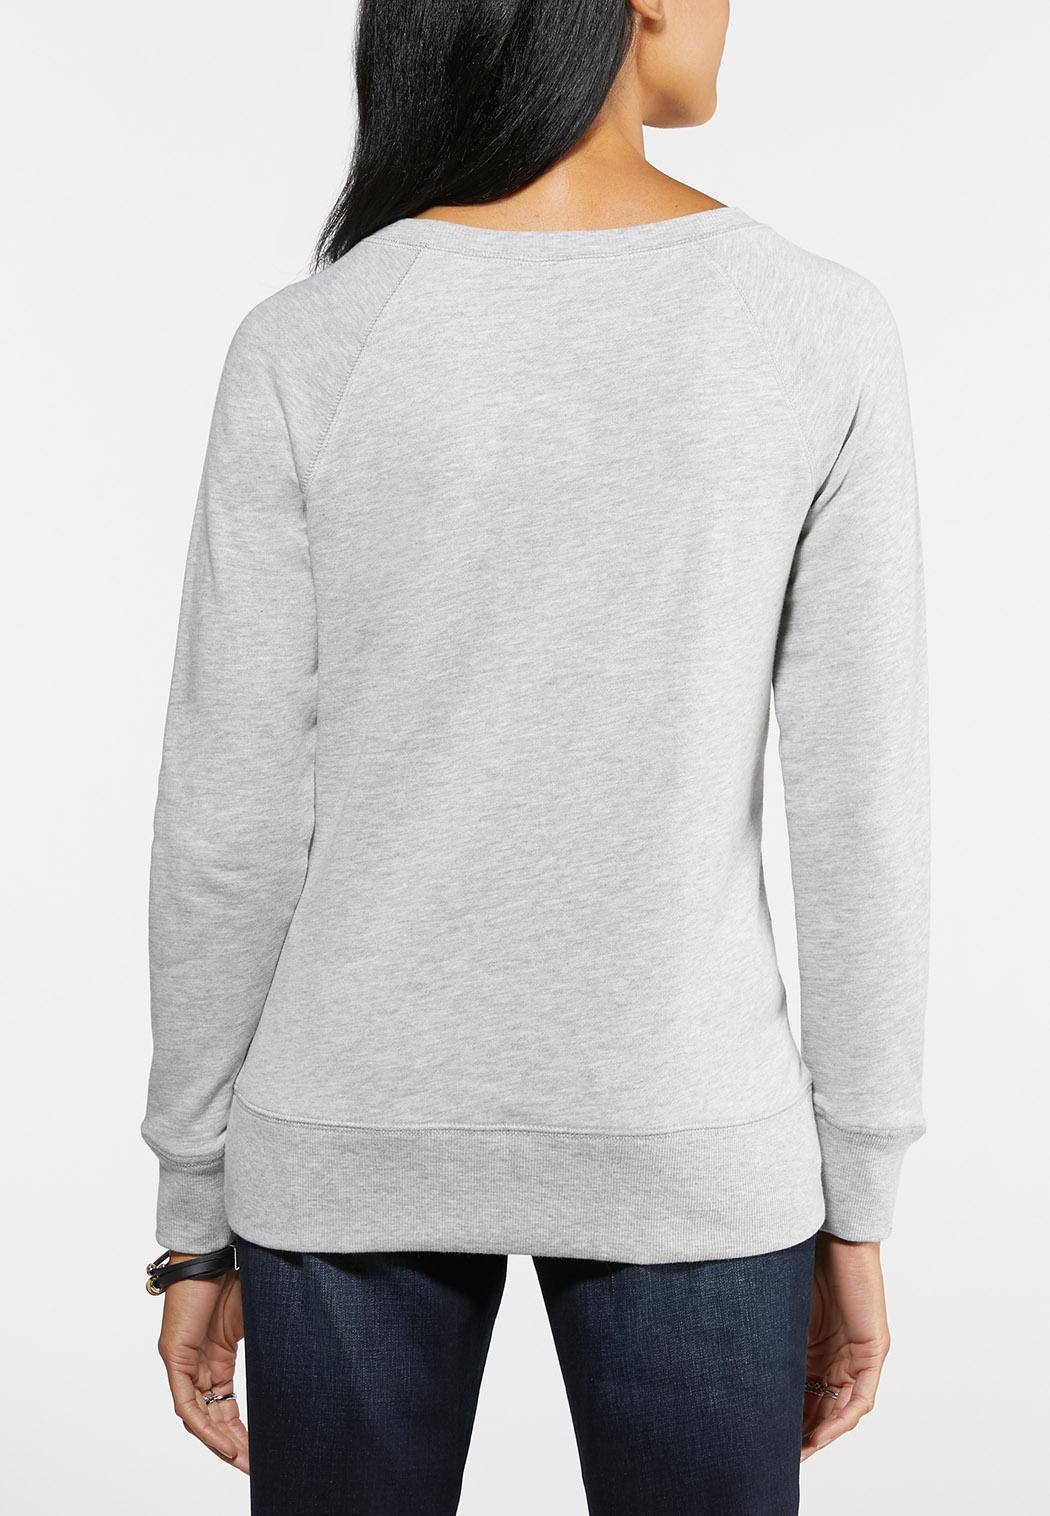 Flannel Season Sweatshirt (Item #44017851)